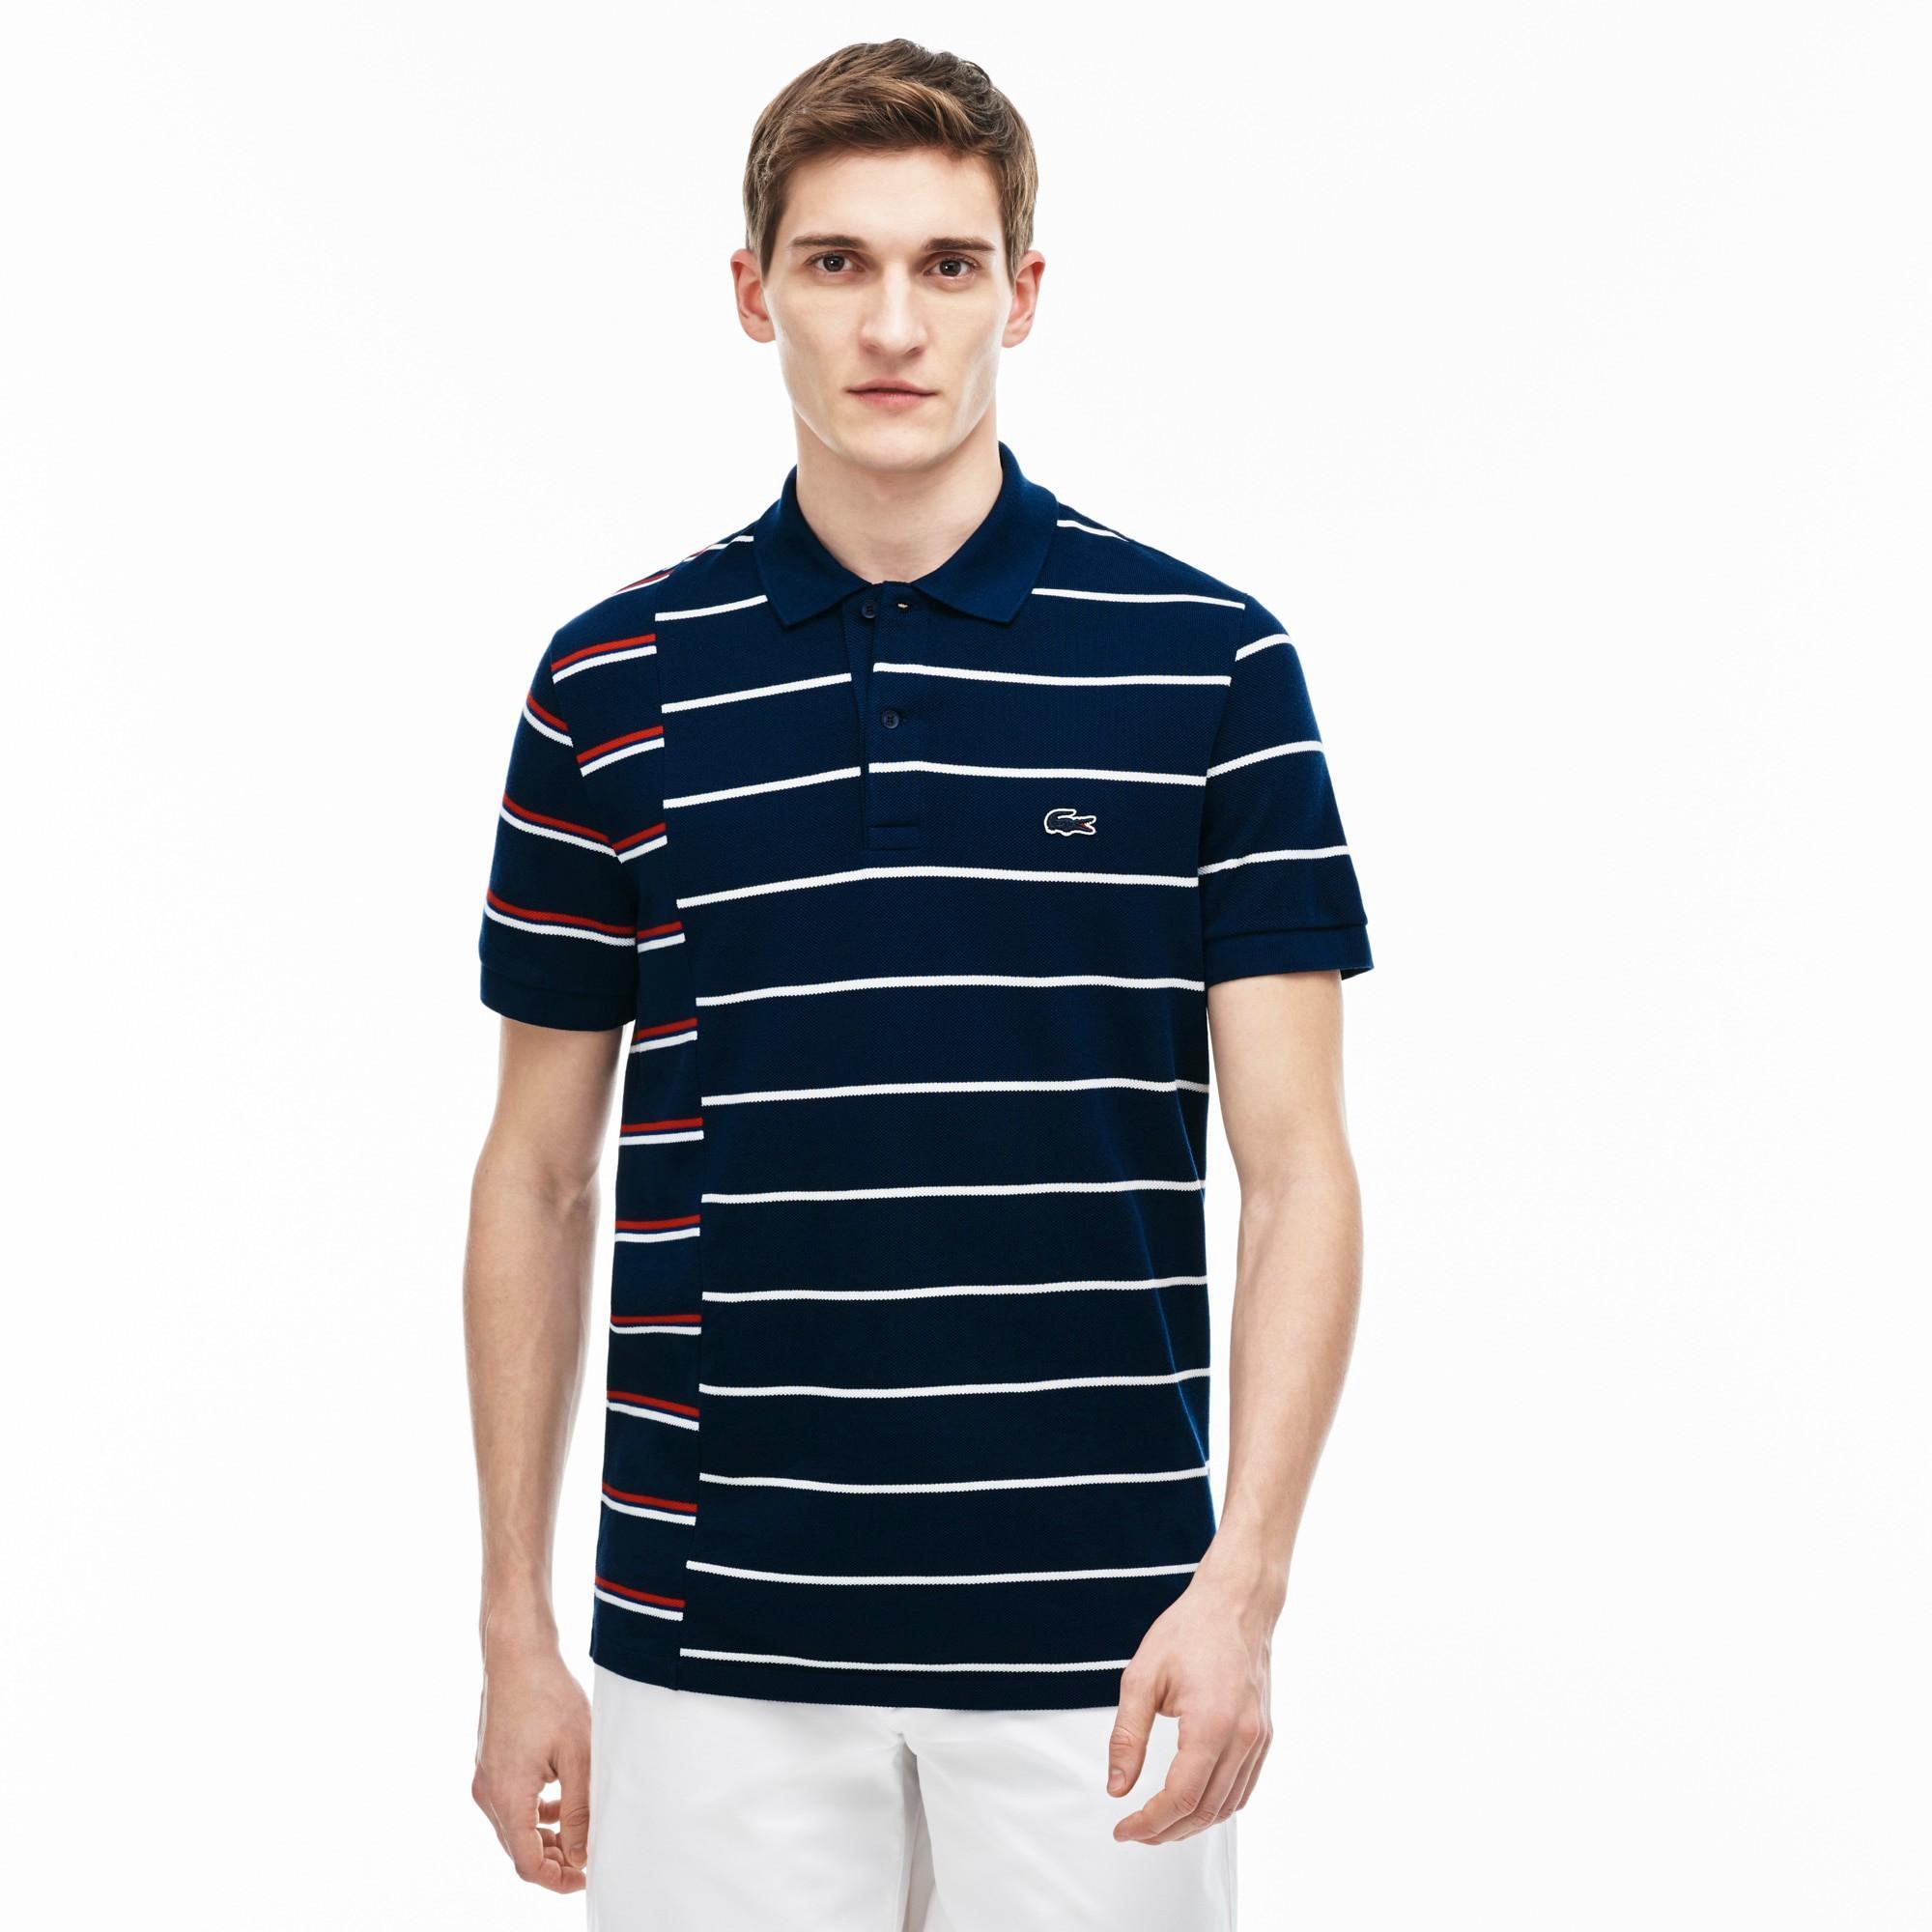 038d68328b9b1 Lacoste Men s Made In France Regular Fit Cotton PiquÉ Polo Shirt -  Ship White-